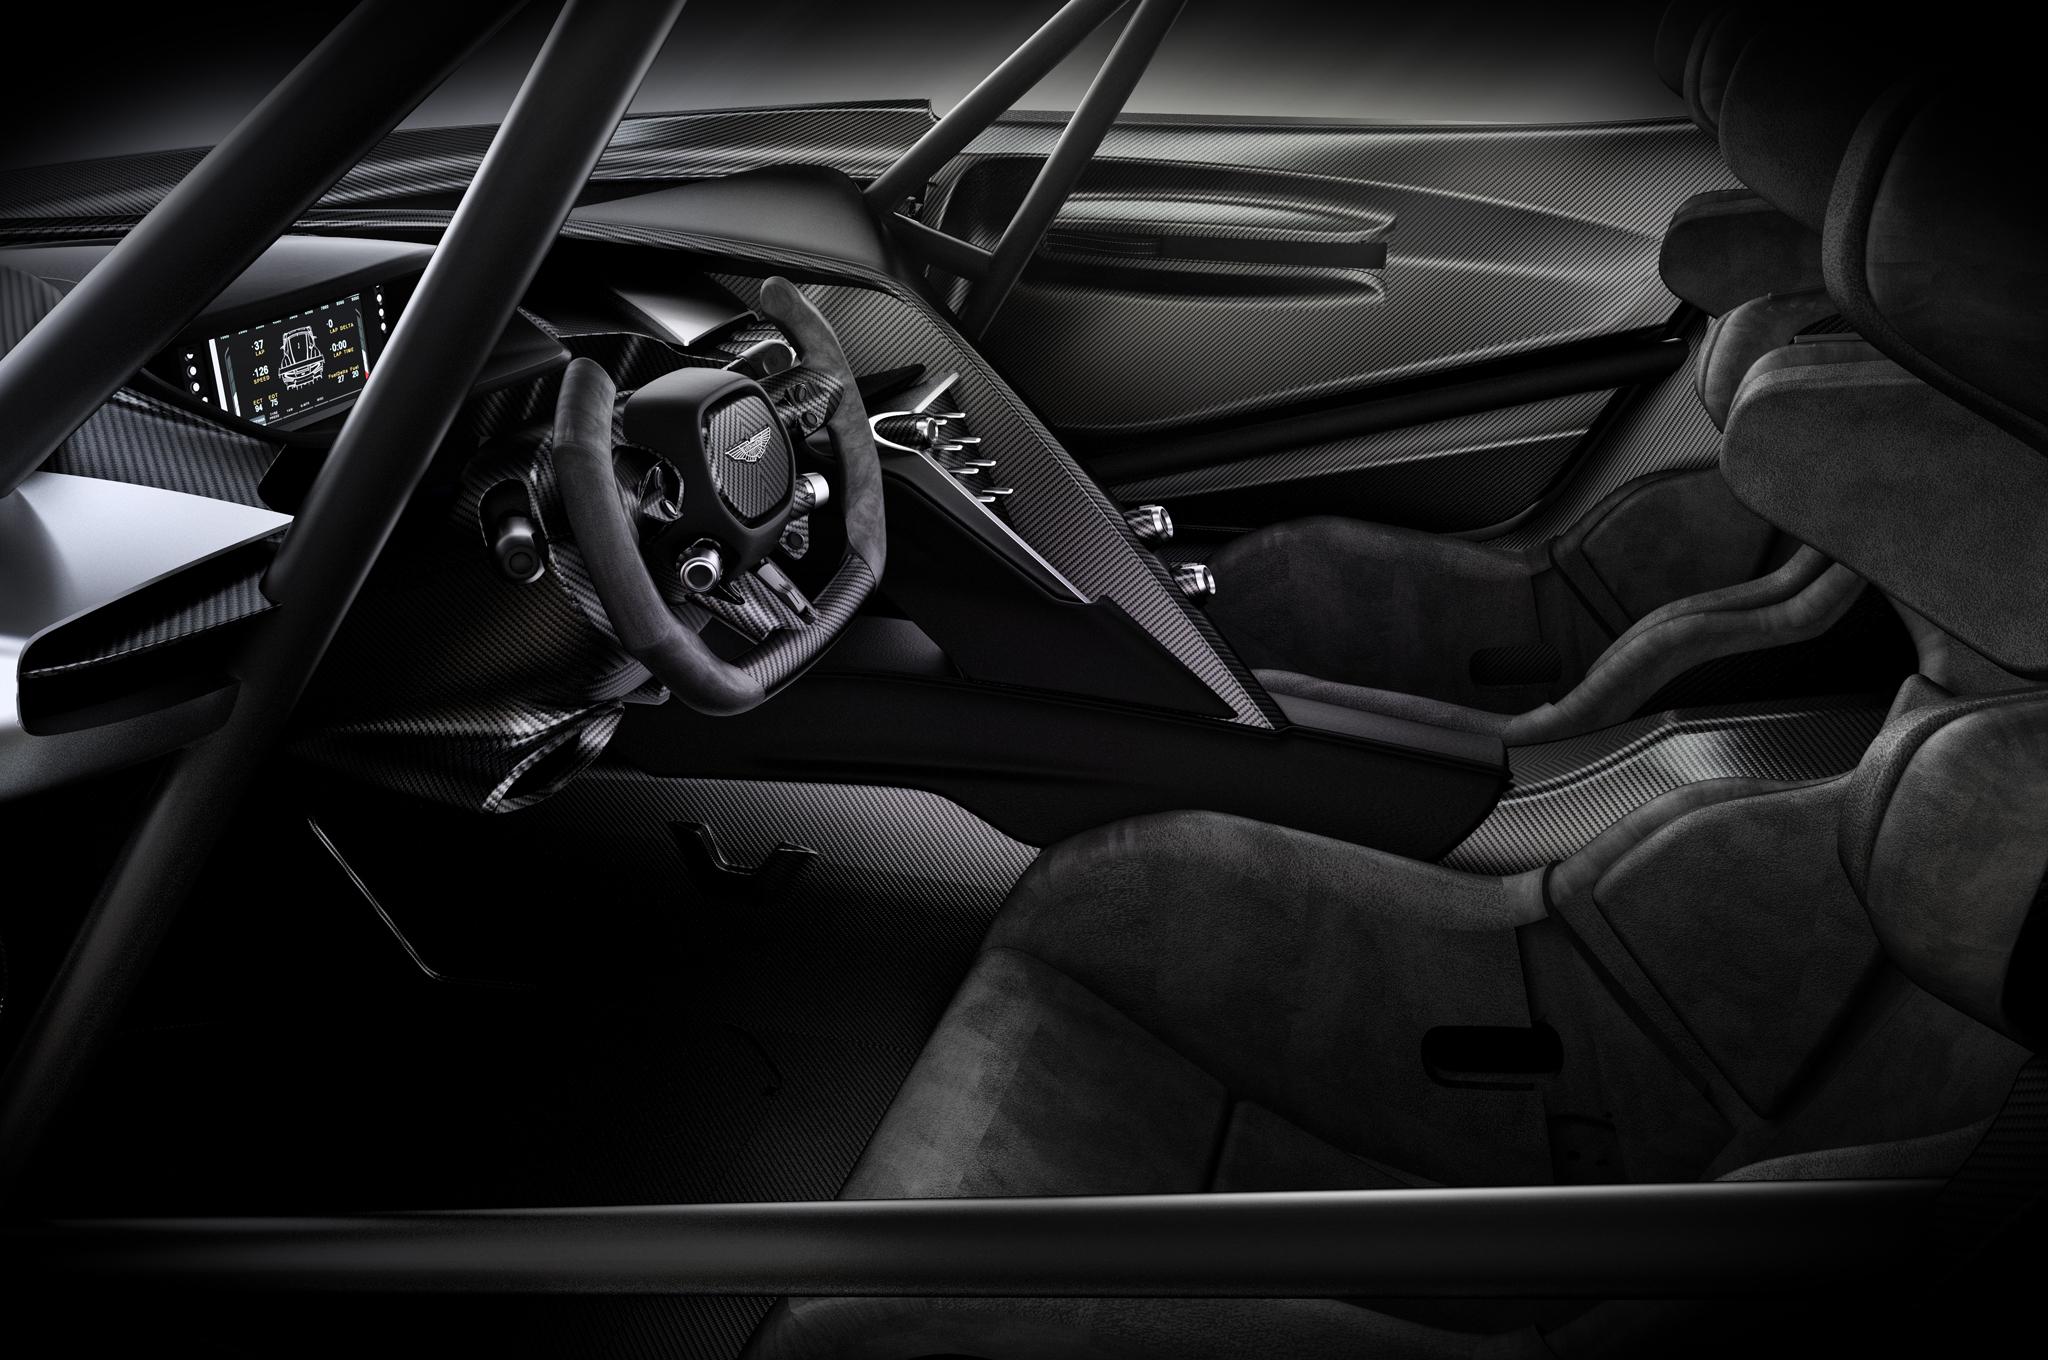 Aston Martin Vulcan Top Gear Jpg Interior Moto Networks